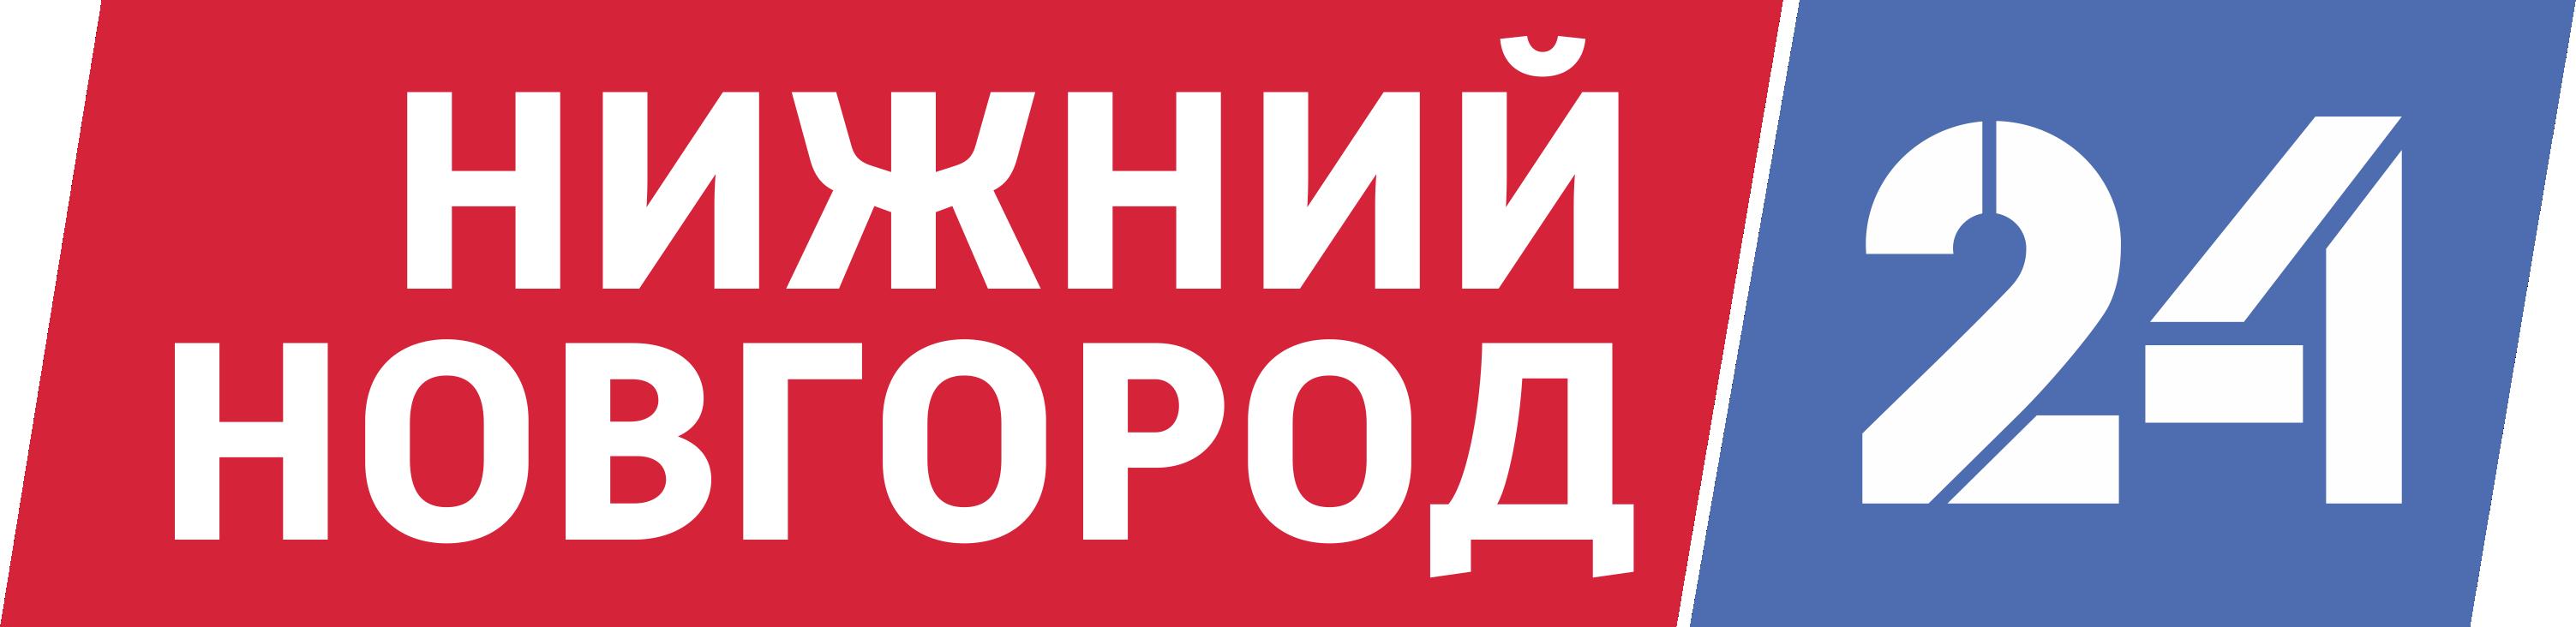 Нижний Новгород 24